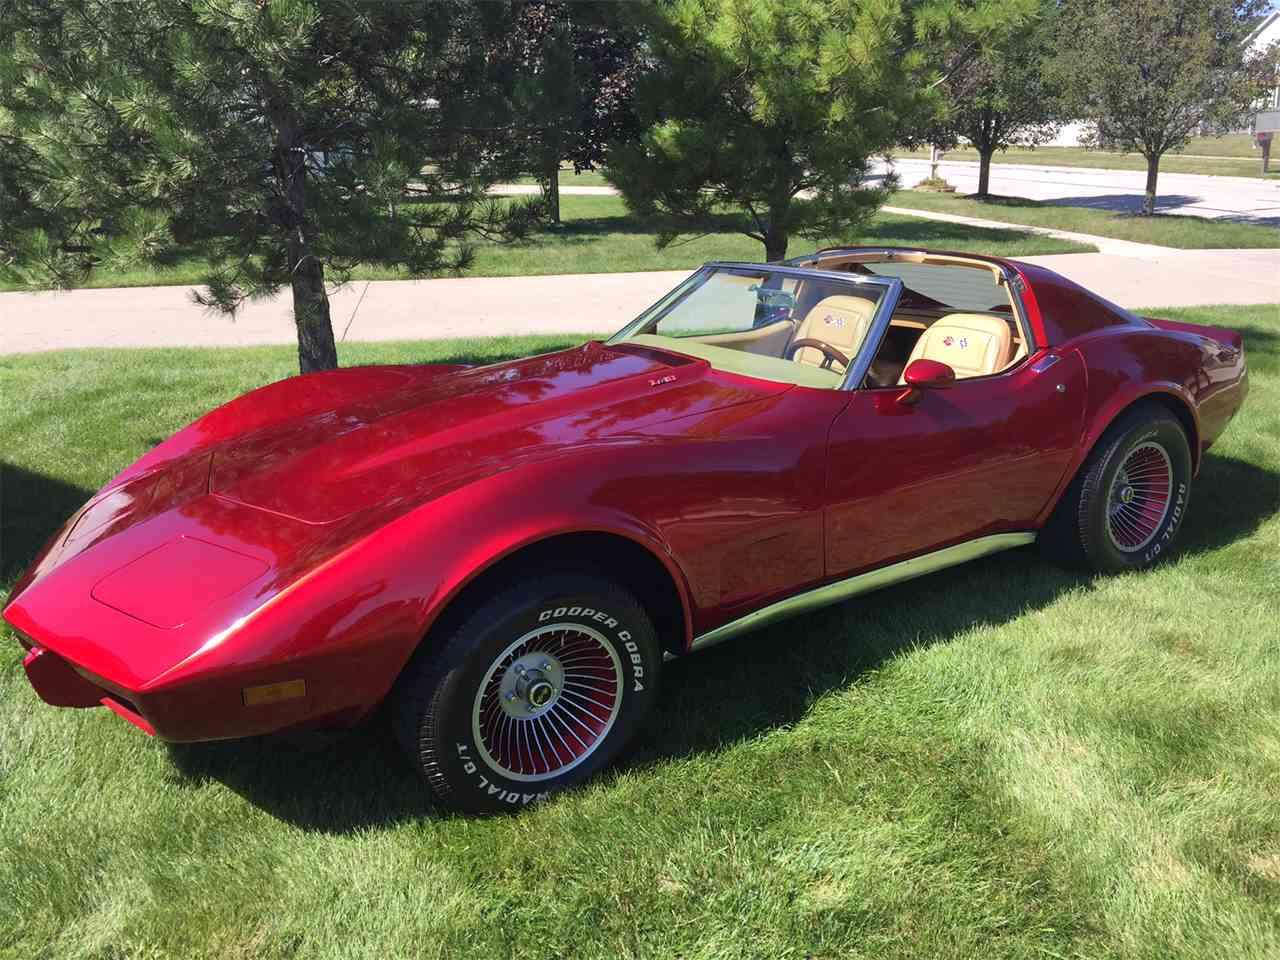 1976 chevrolet corvette for sale cc 1027800. Black Bedroom Furniture Sets. Home Design Ideas